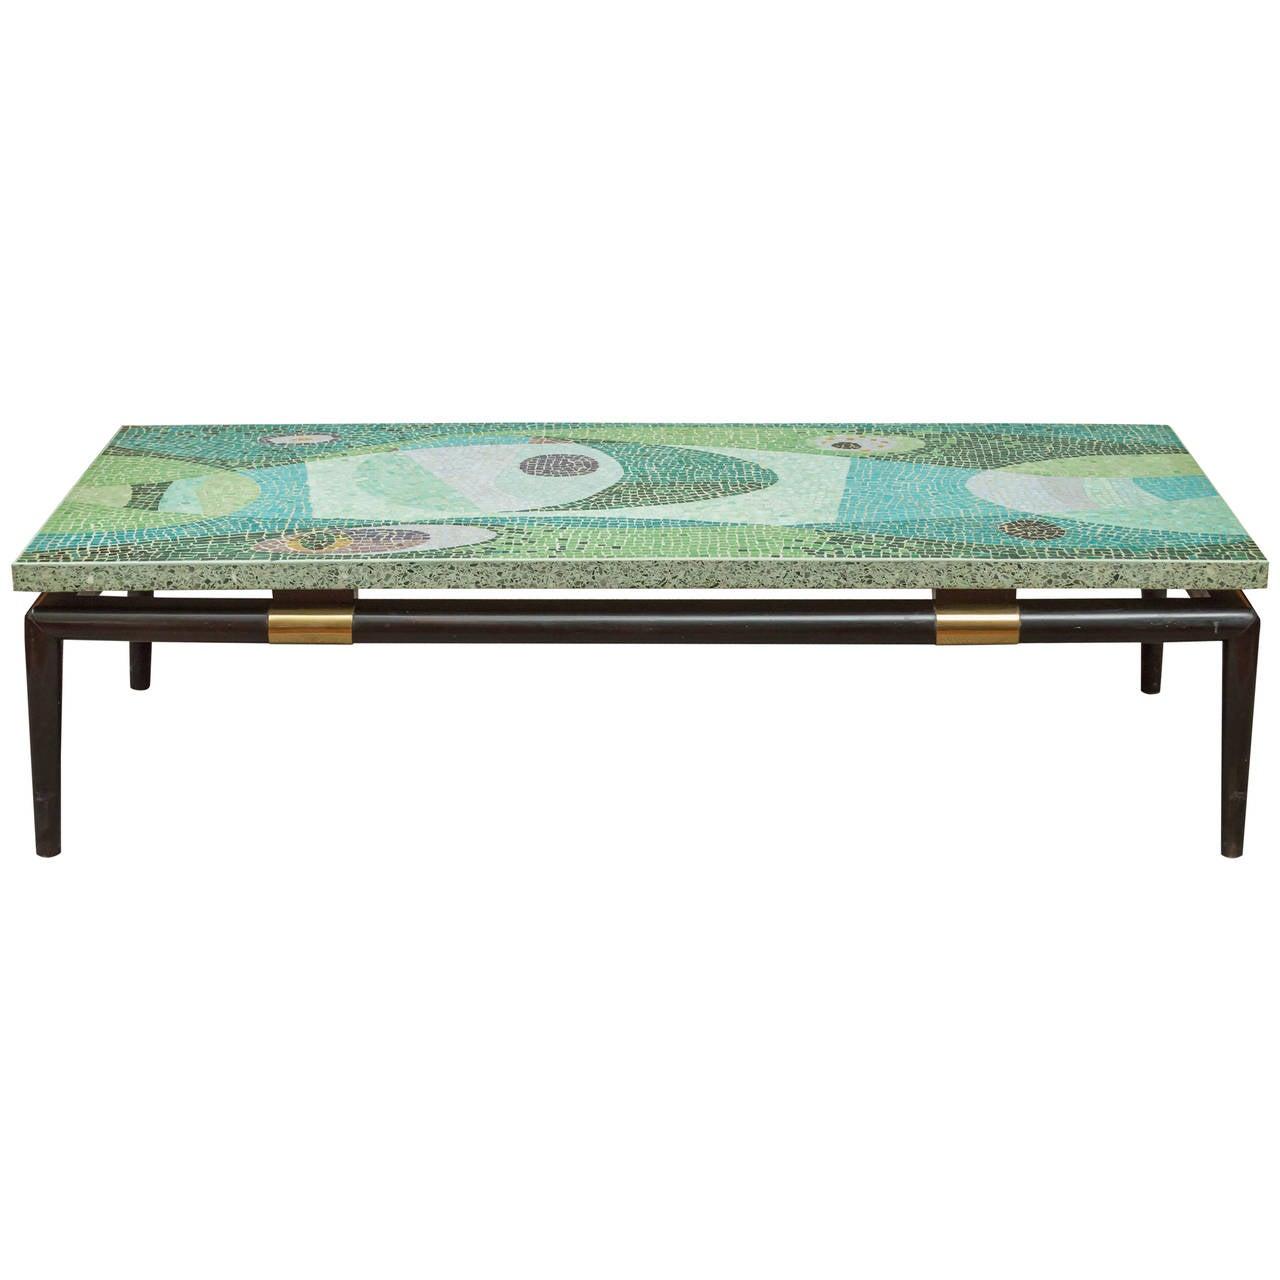 mid century modern mosaic coffee table. Black Bedroom Furniture Sets. Home Design Ideas